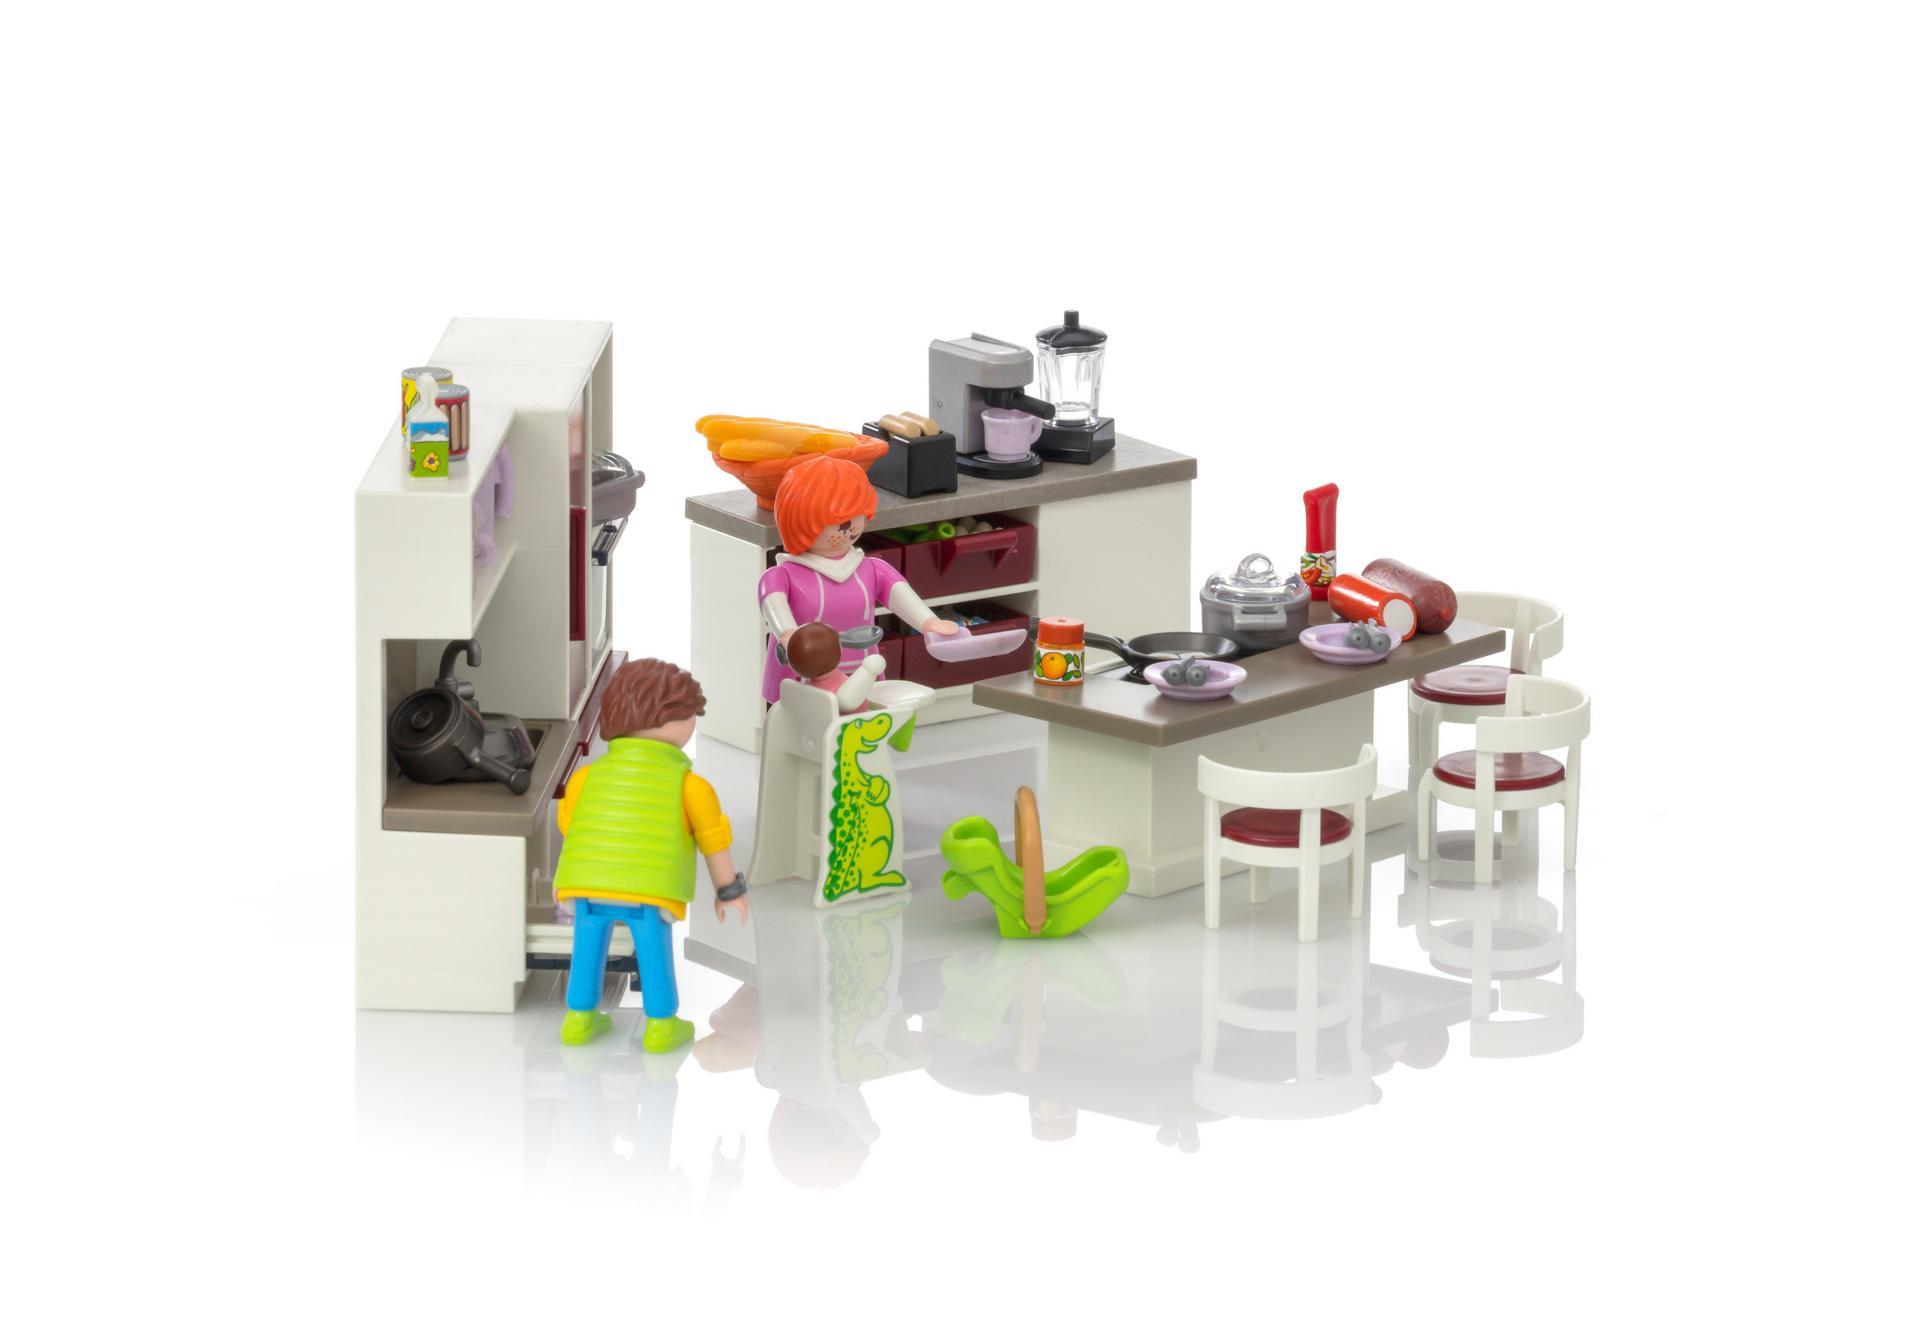 Kitchen - 9269 - PLAYMOBIL® United Kingdom